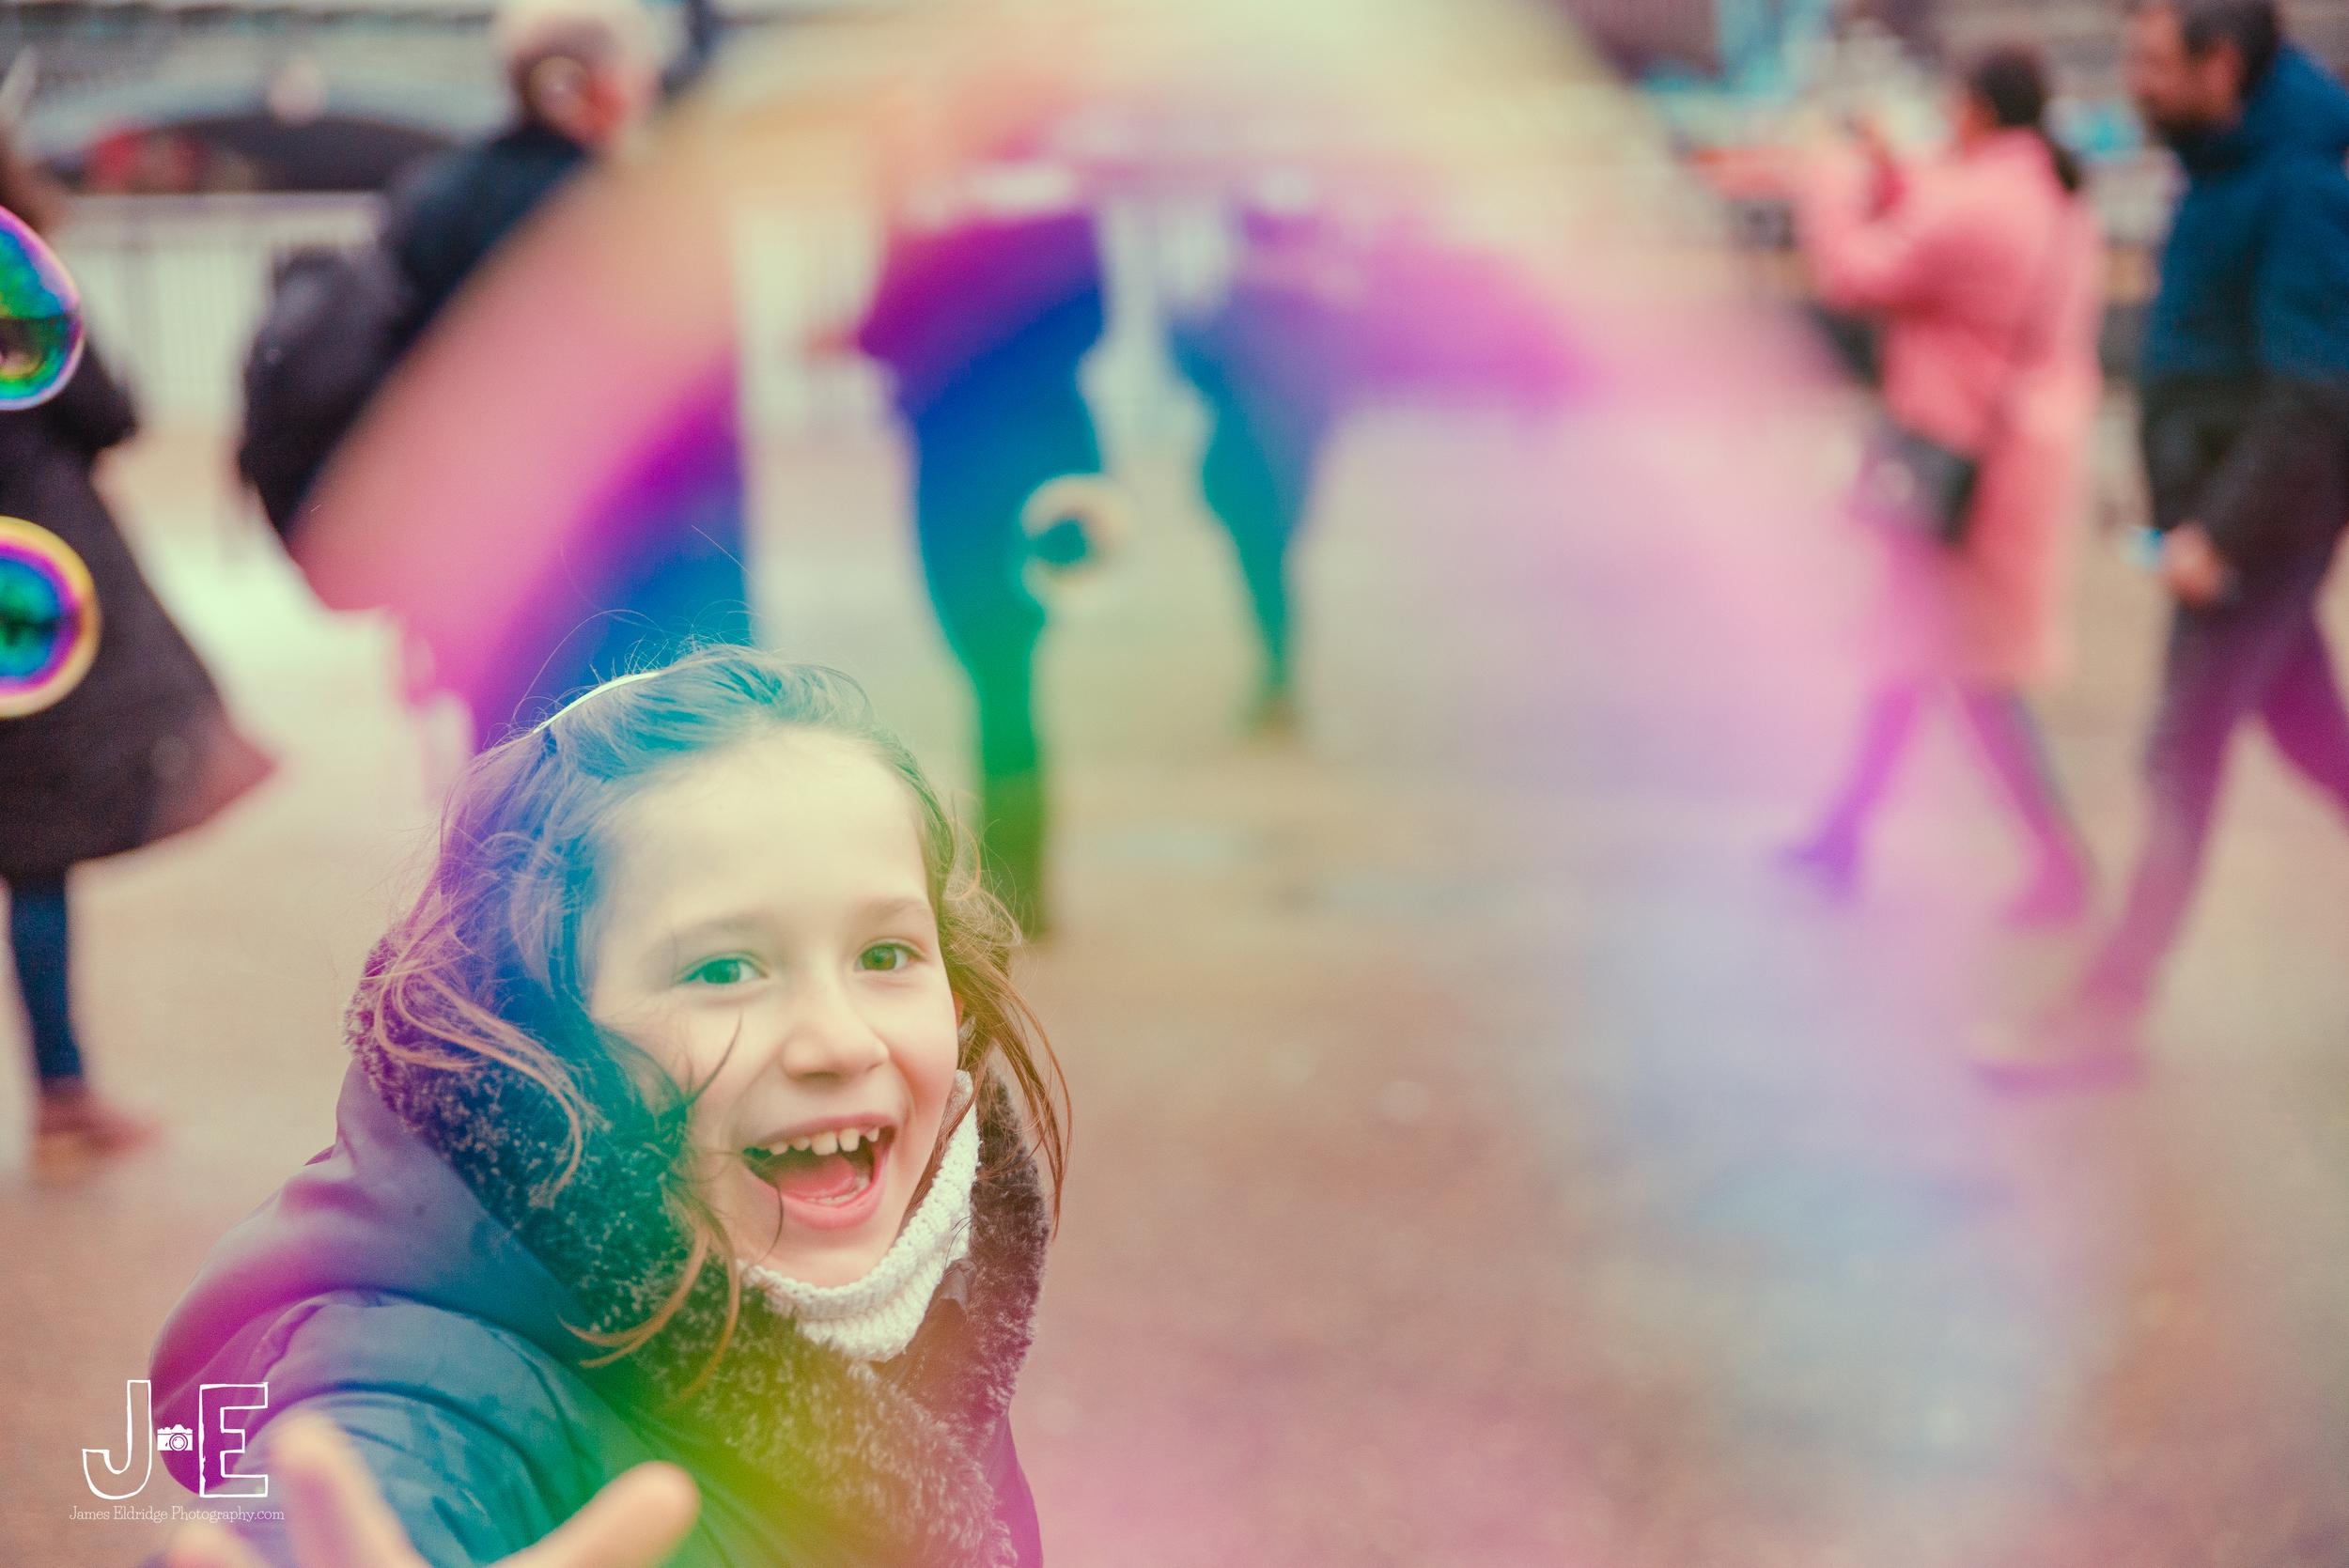 london bubbles street photography